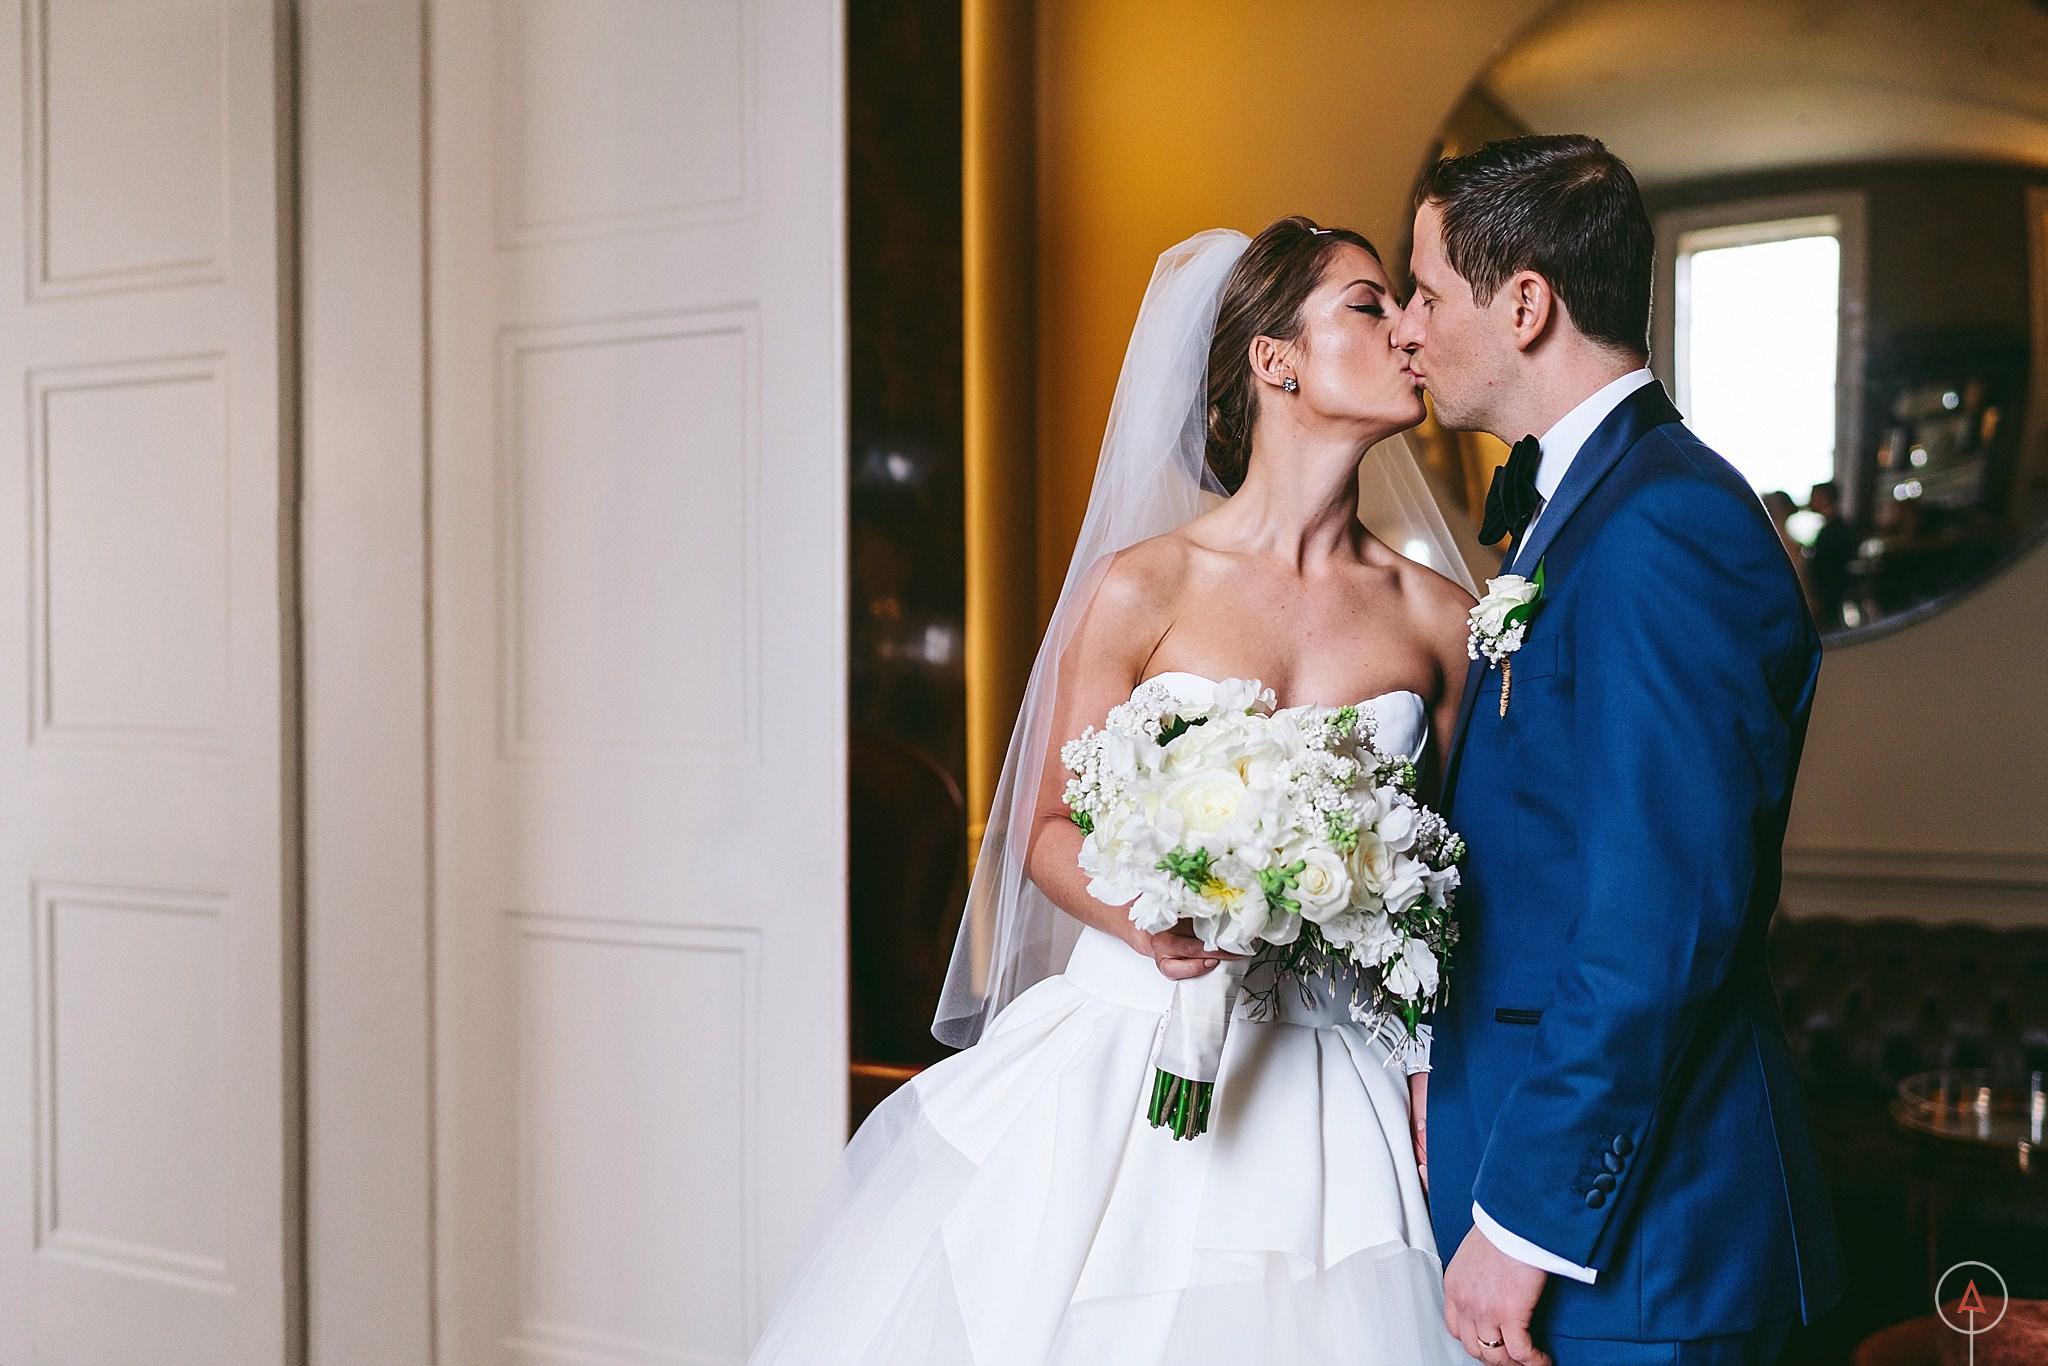 cardiff-wedding-photographer-aga-tomaszek_0284